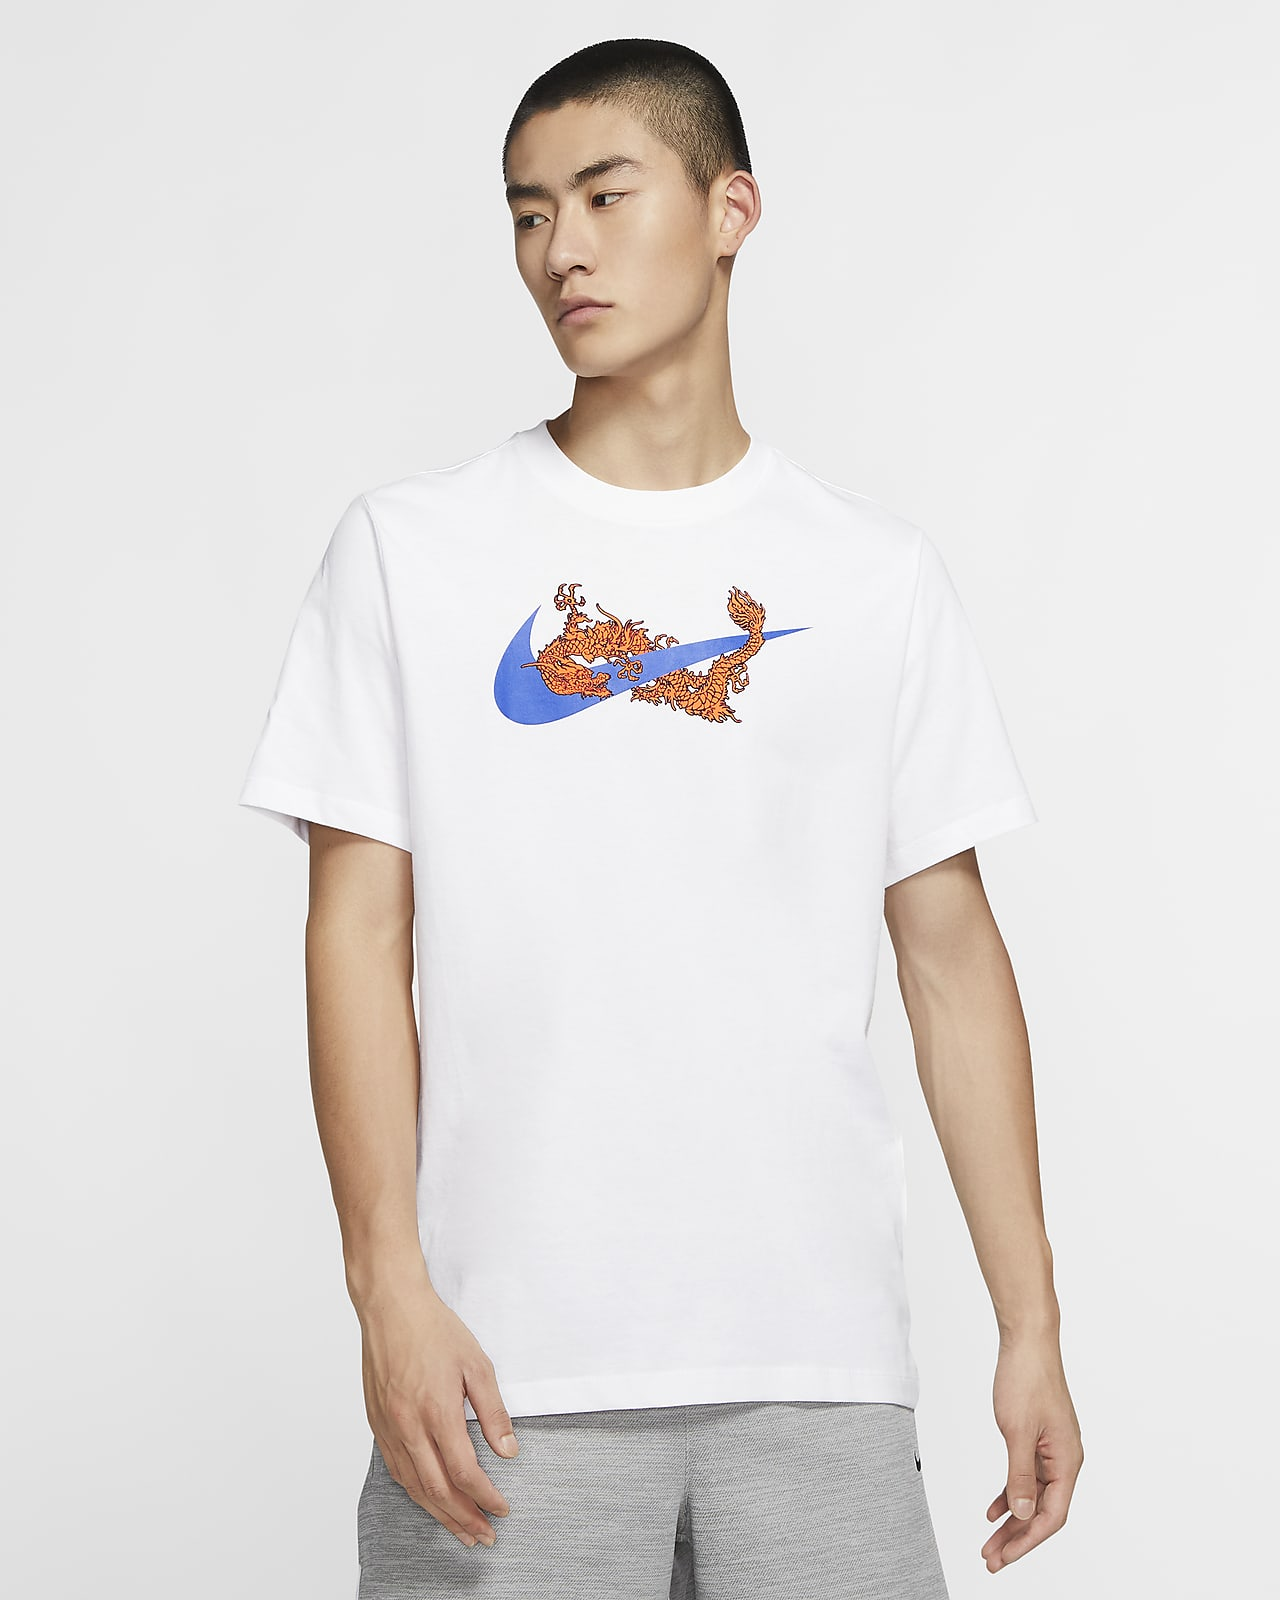 Tee-shirt de basketball Nike Exploration Series pour Homme